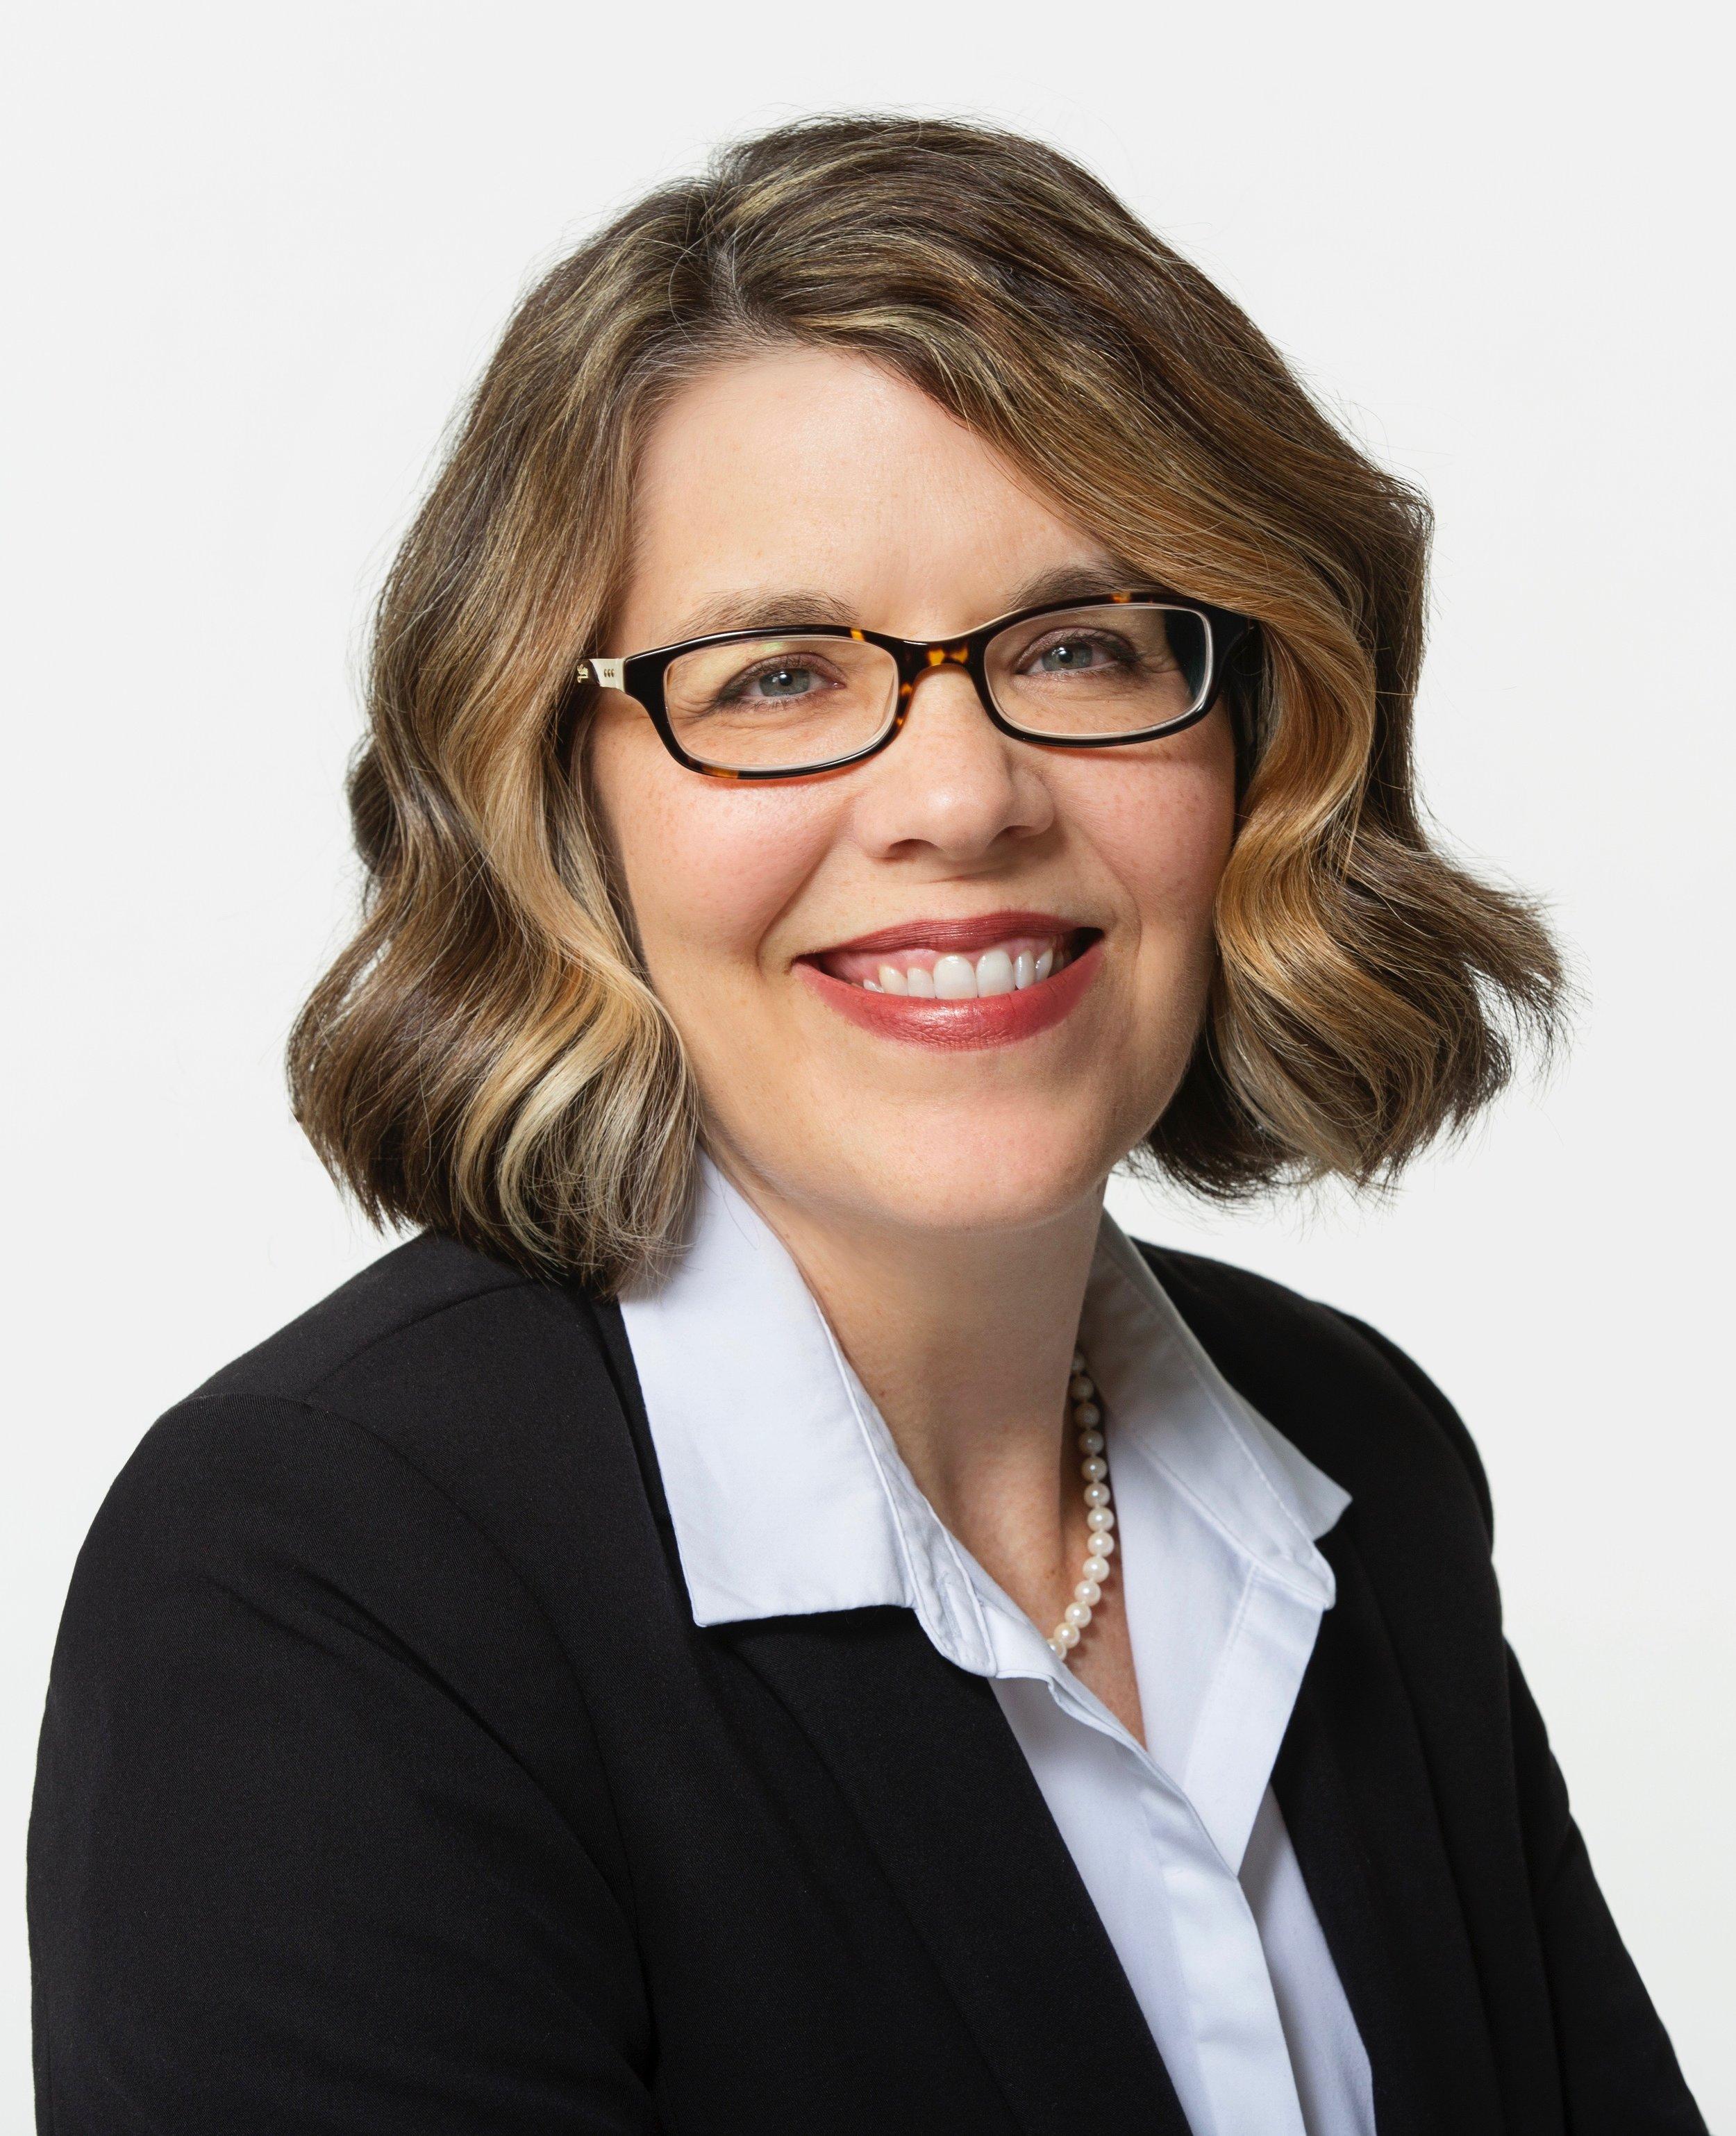 Juleigh D. Moon - Legal Secretary